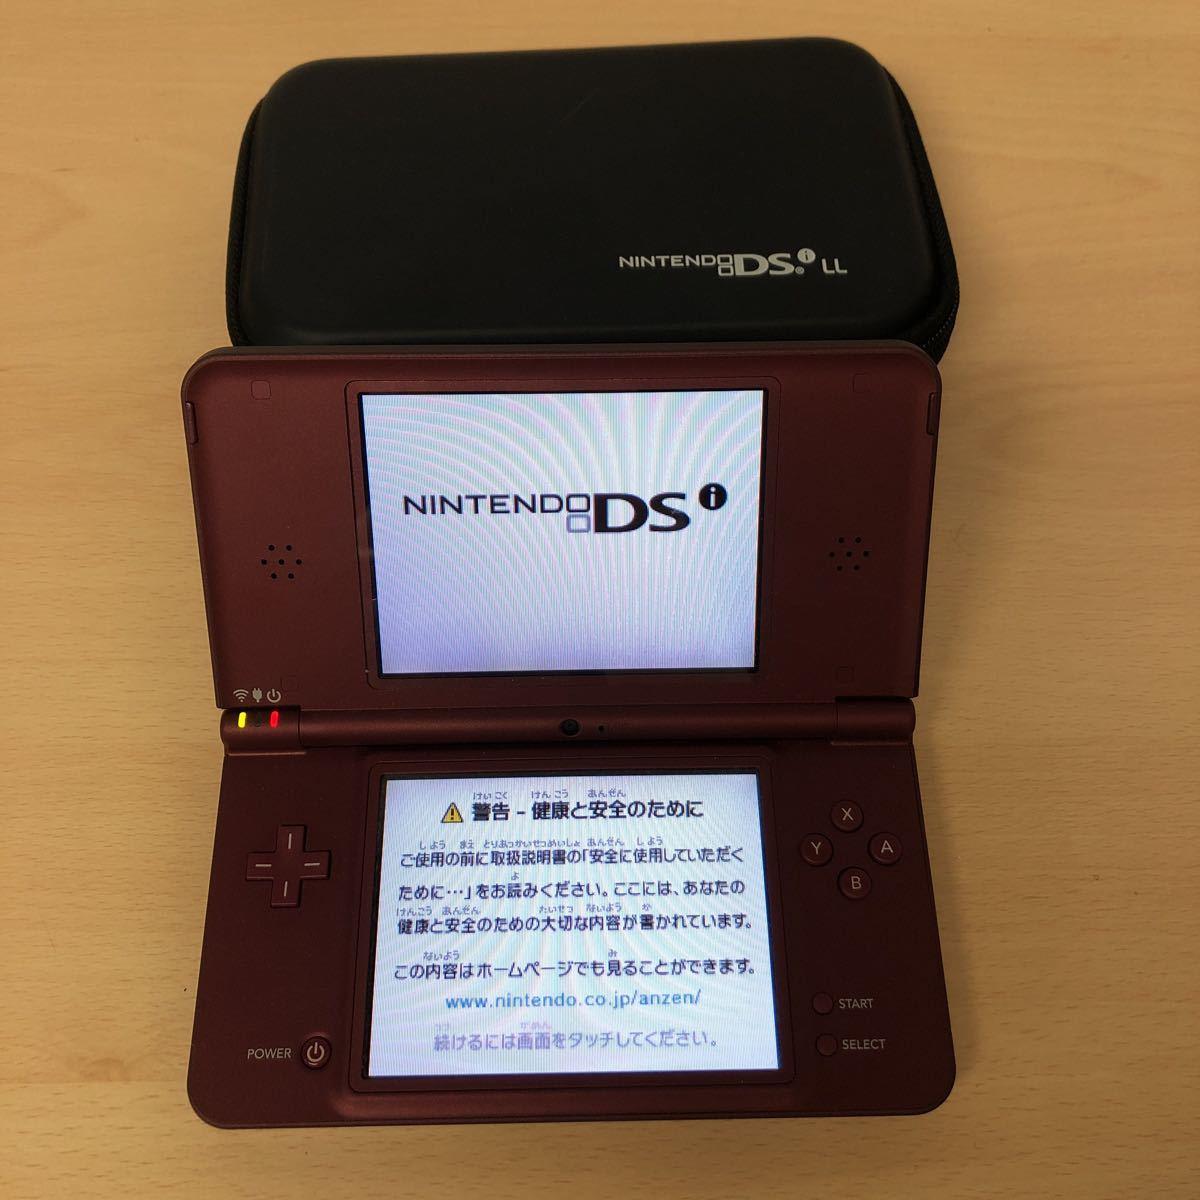 NINTENDO ニンテンドー DSiLL ラセットブラウン ソフト5本付き ジャンク品_画像2